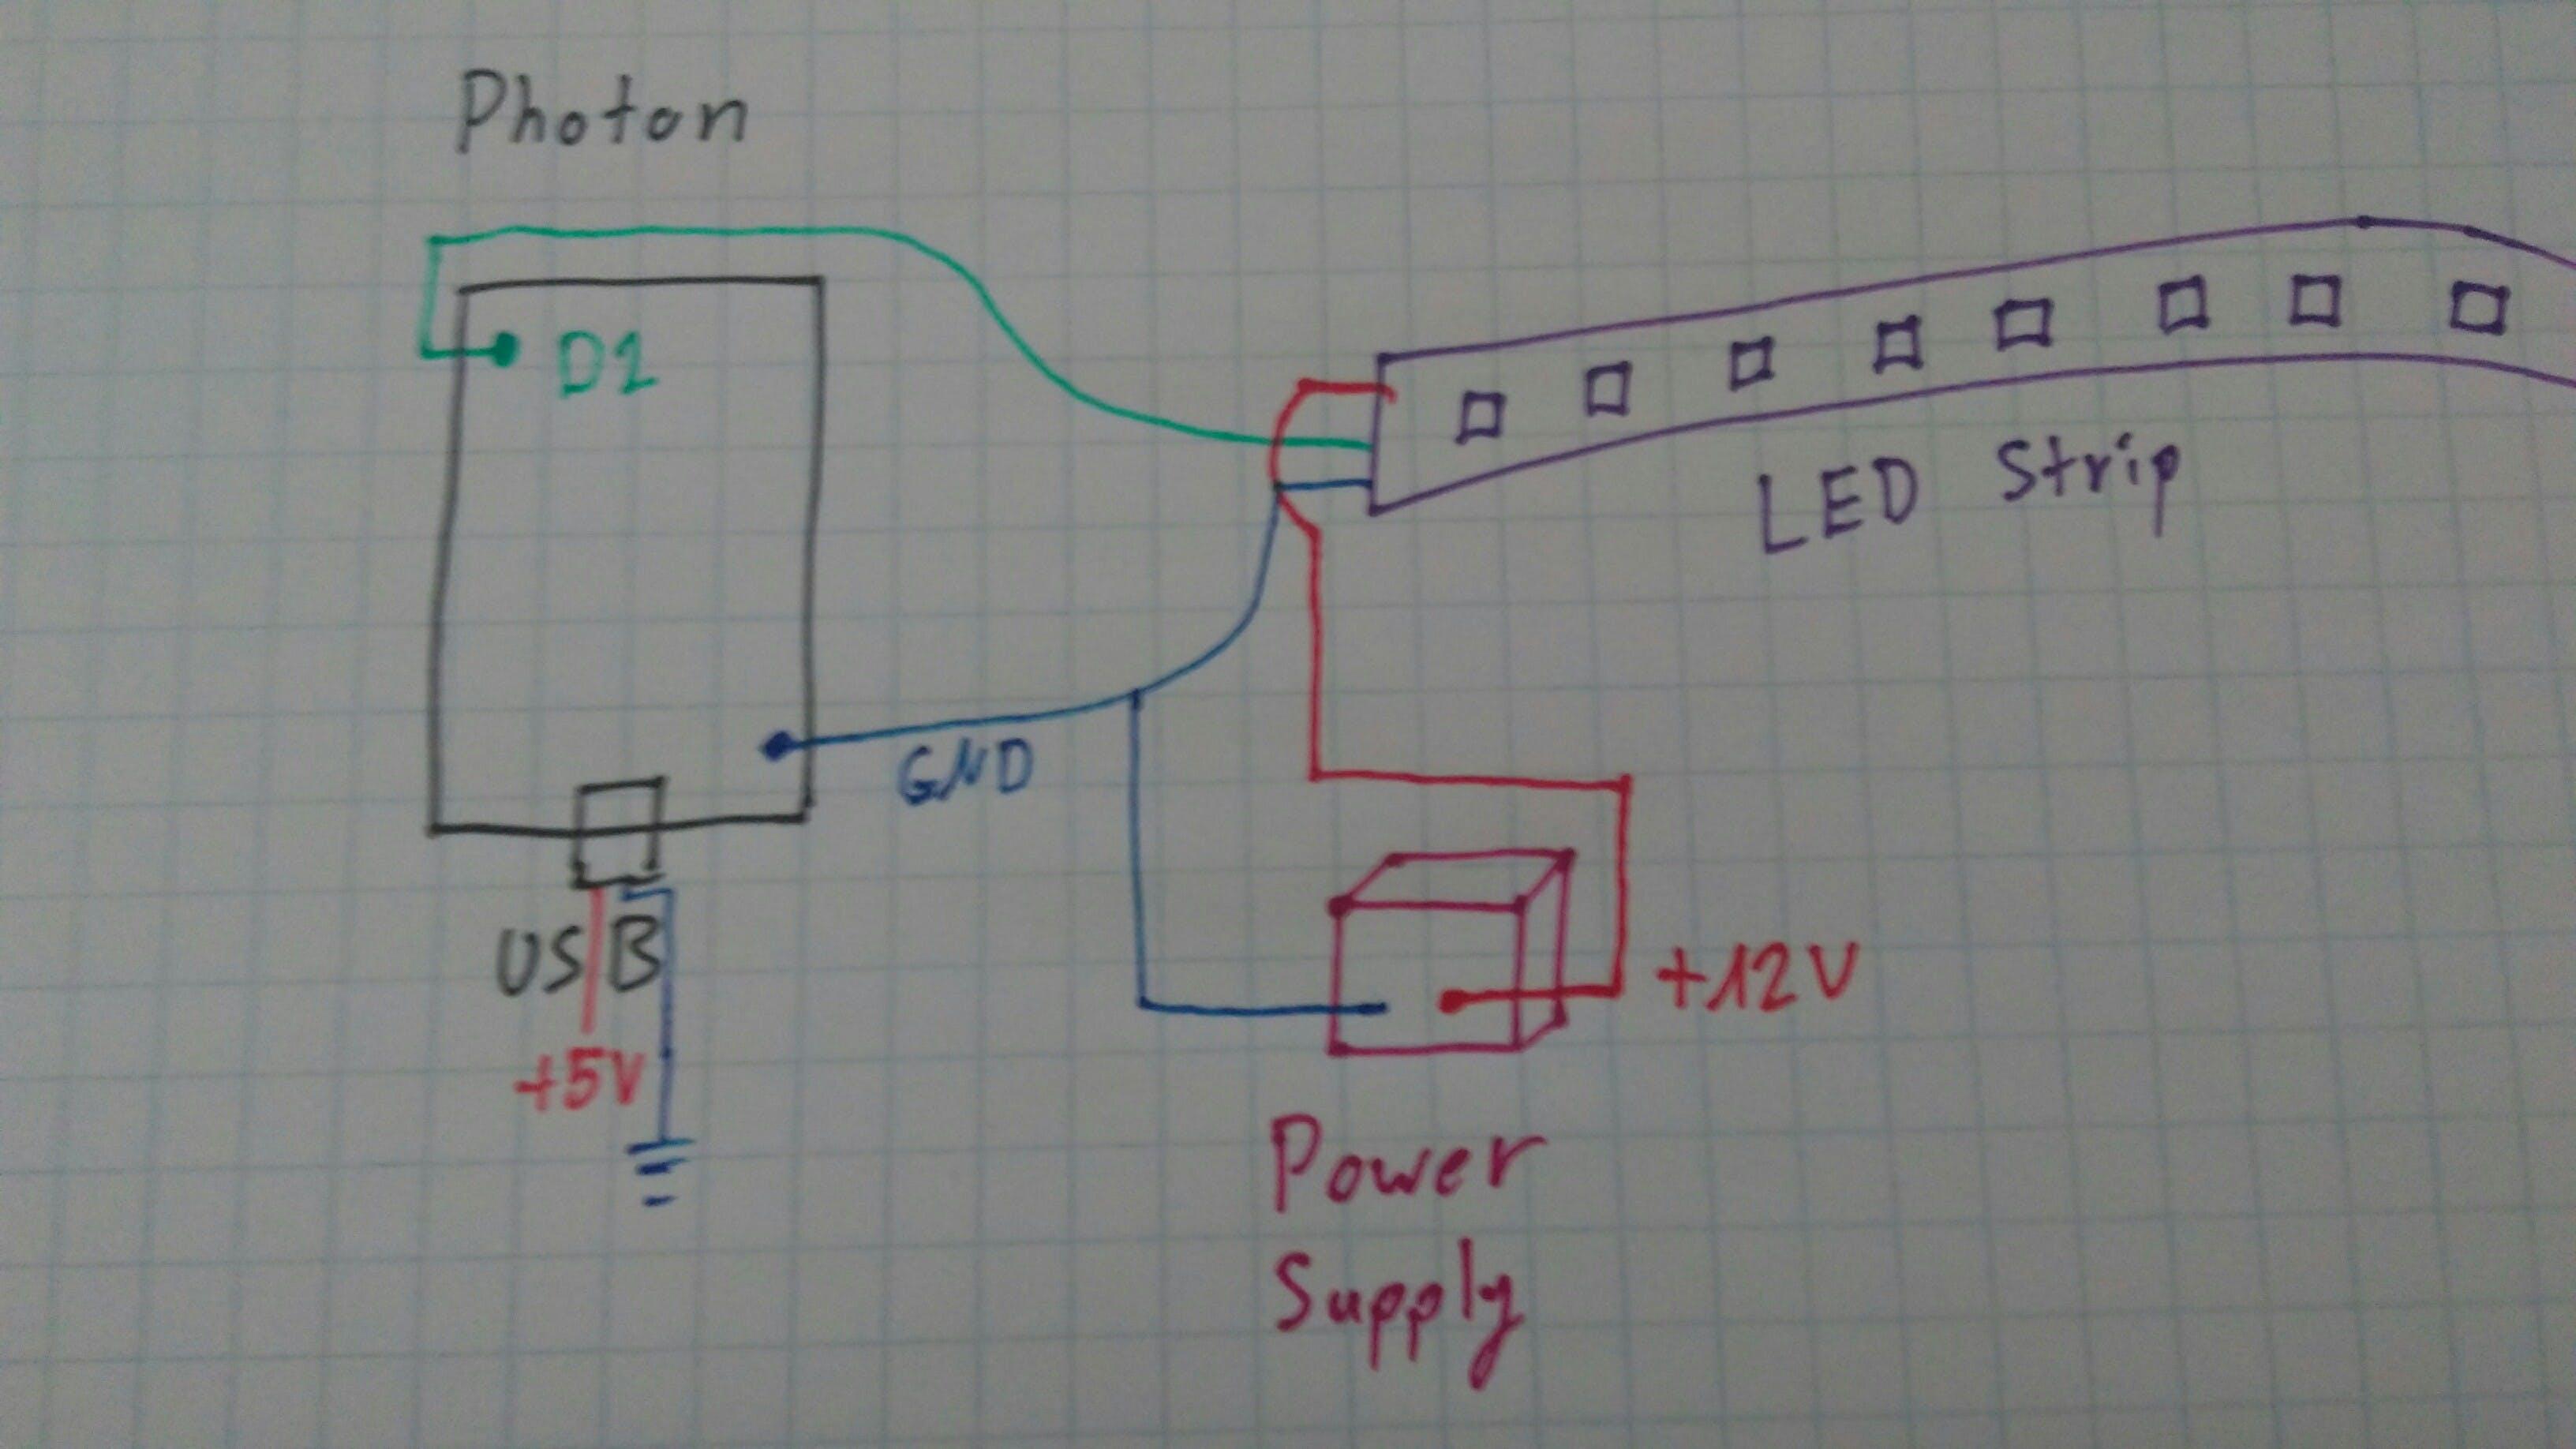 My current wiring setup